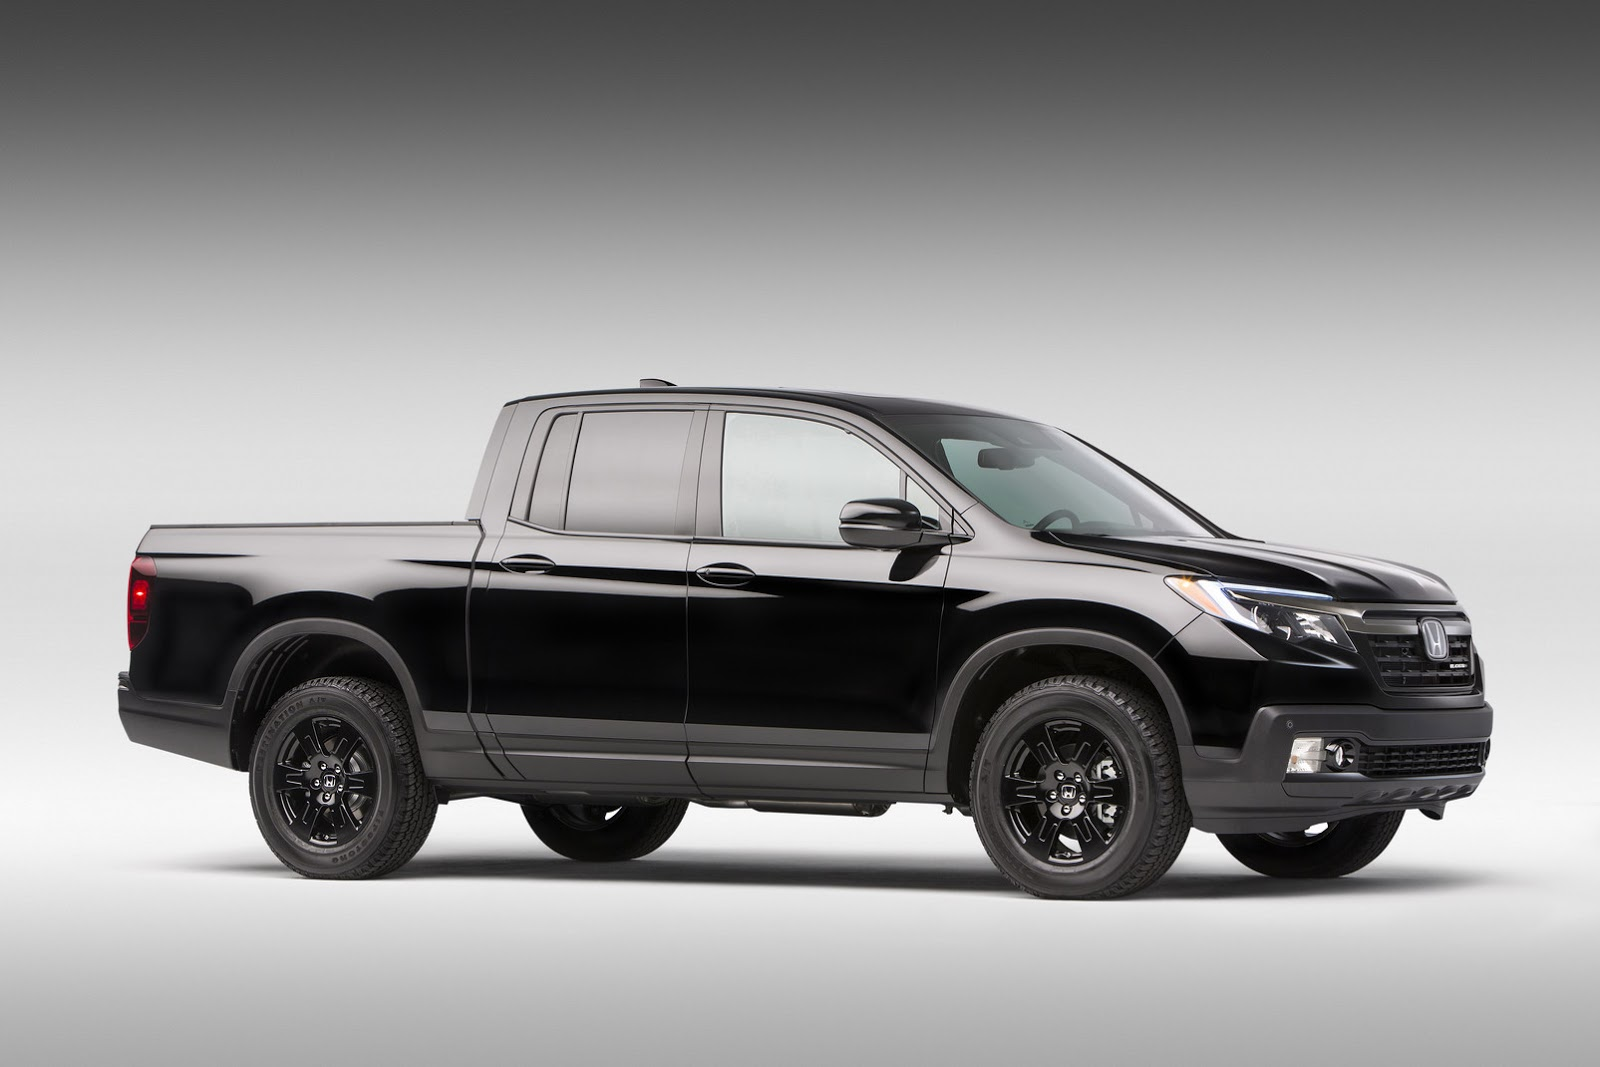 2017 ridgeline is honda s new soft pickup truck updated gallery carscoops. Black Bedroom Furniture Sets. Home Design Ideas